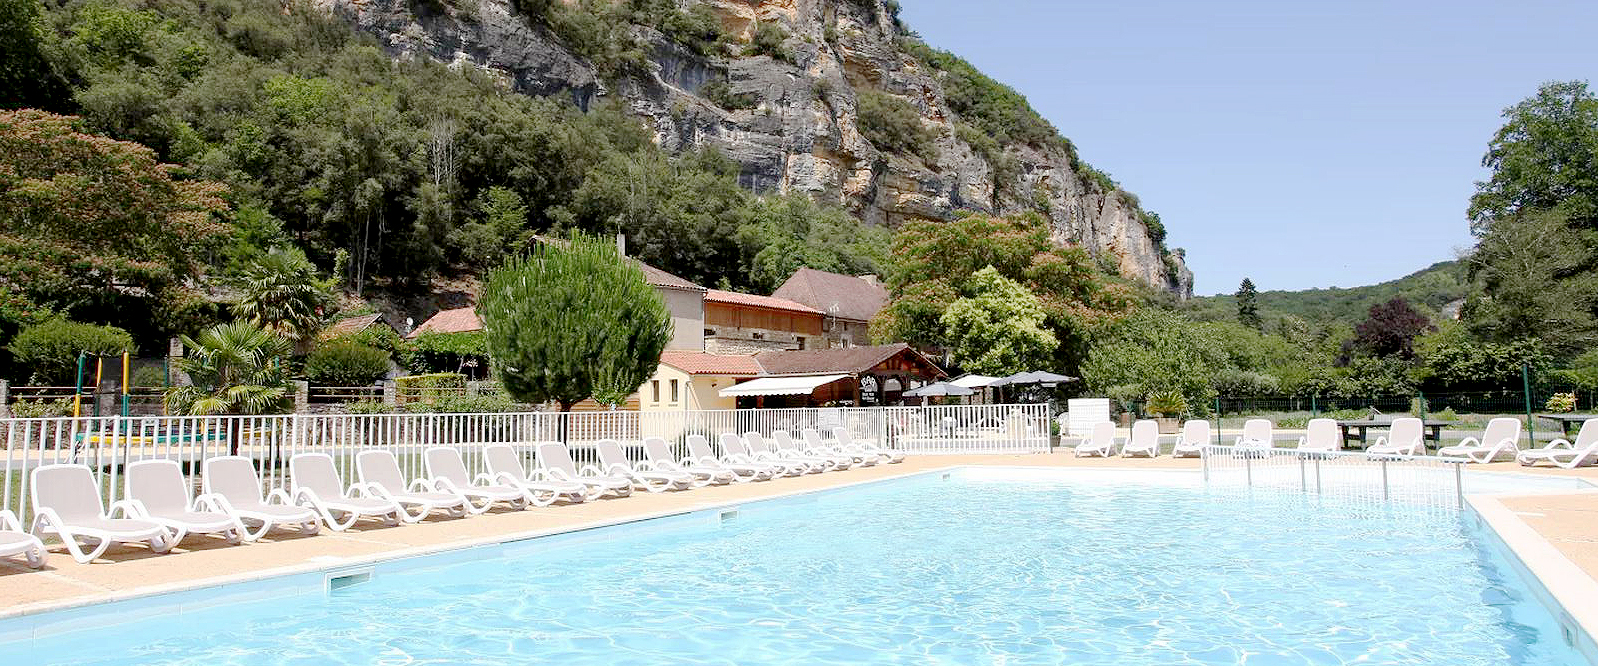 Beautiful Campsite Sarlat   3 Star Campsite Dordogne Perigord   Camping De La Plage  Vézac   Site Officiel